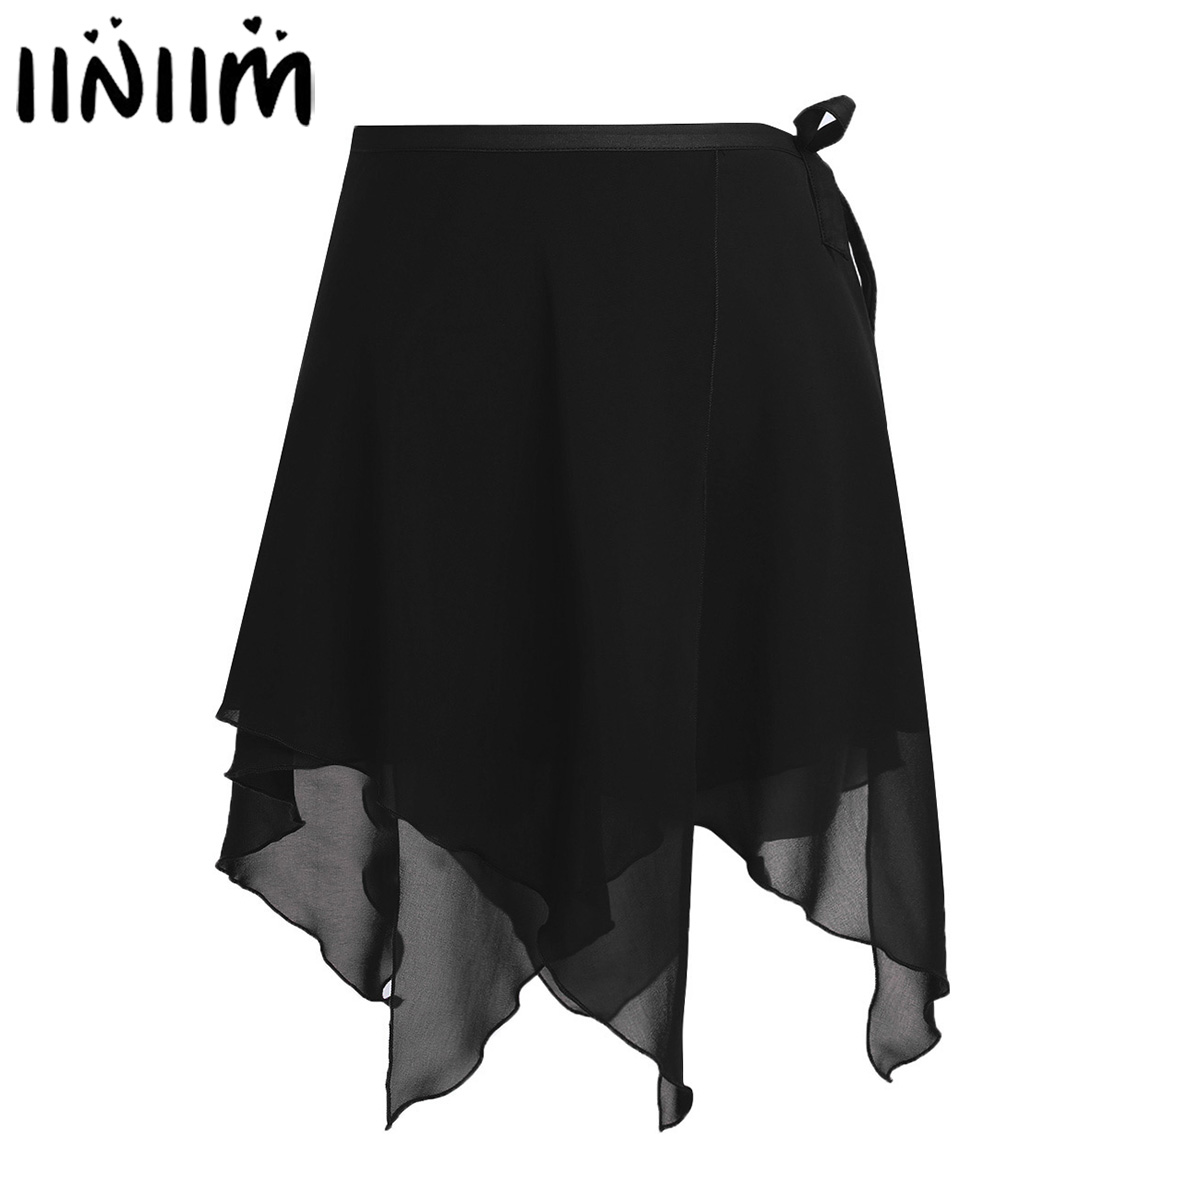 Women Asymmetric Ballet Dance Skirts Chiffon Ballet Wrap Skirt Dance Skate Wrap Over Scarf With Waist Tie Adult Gymnastic Skirt